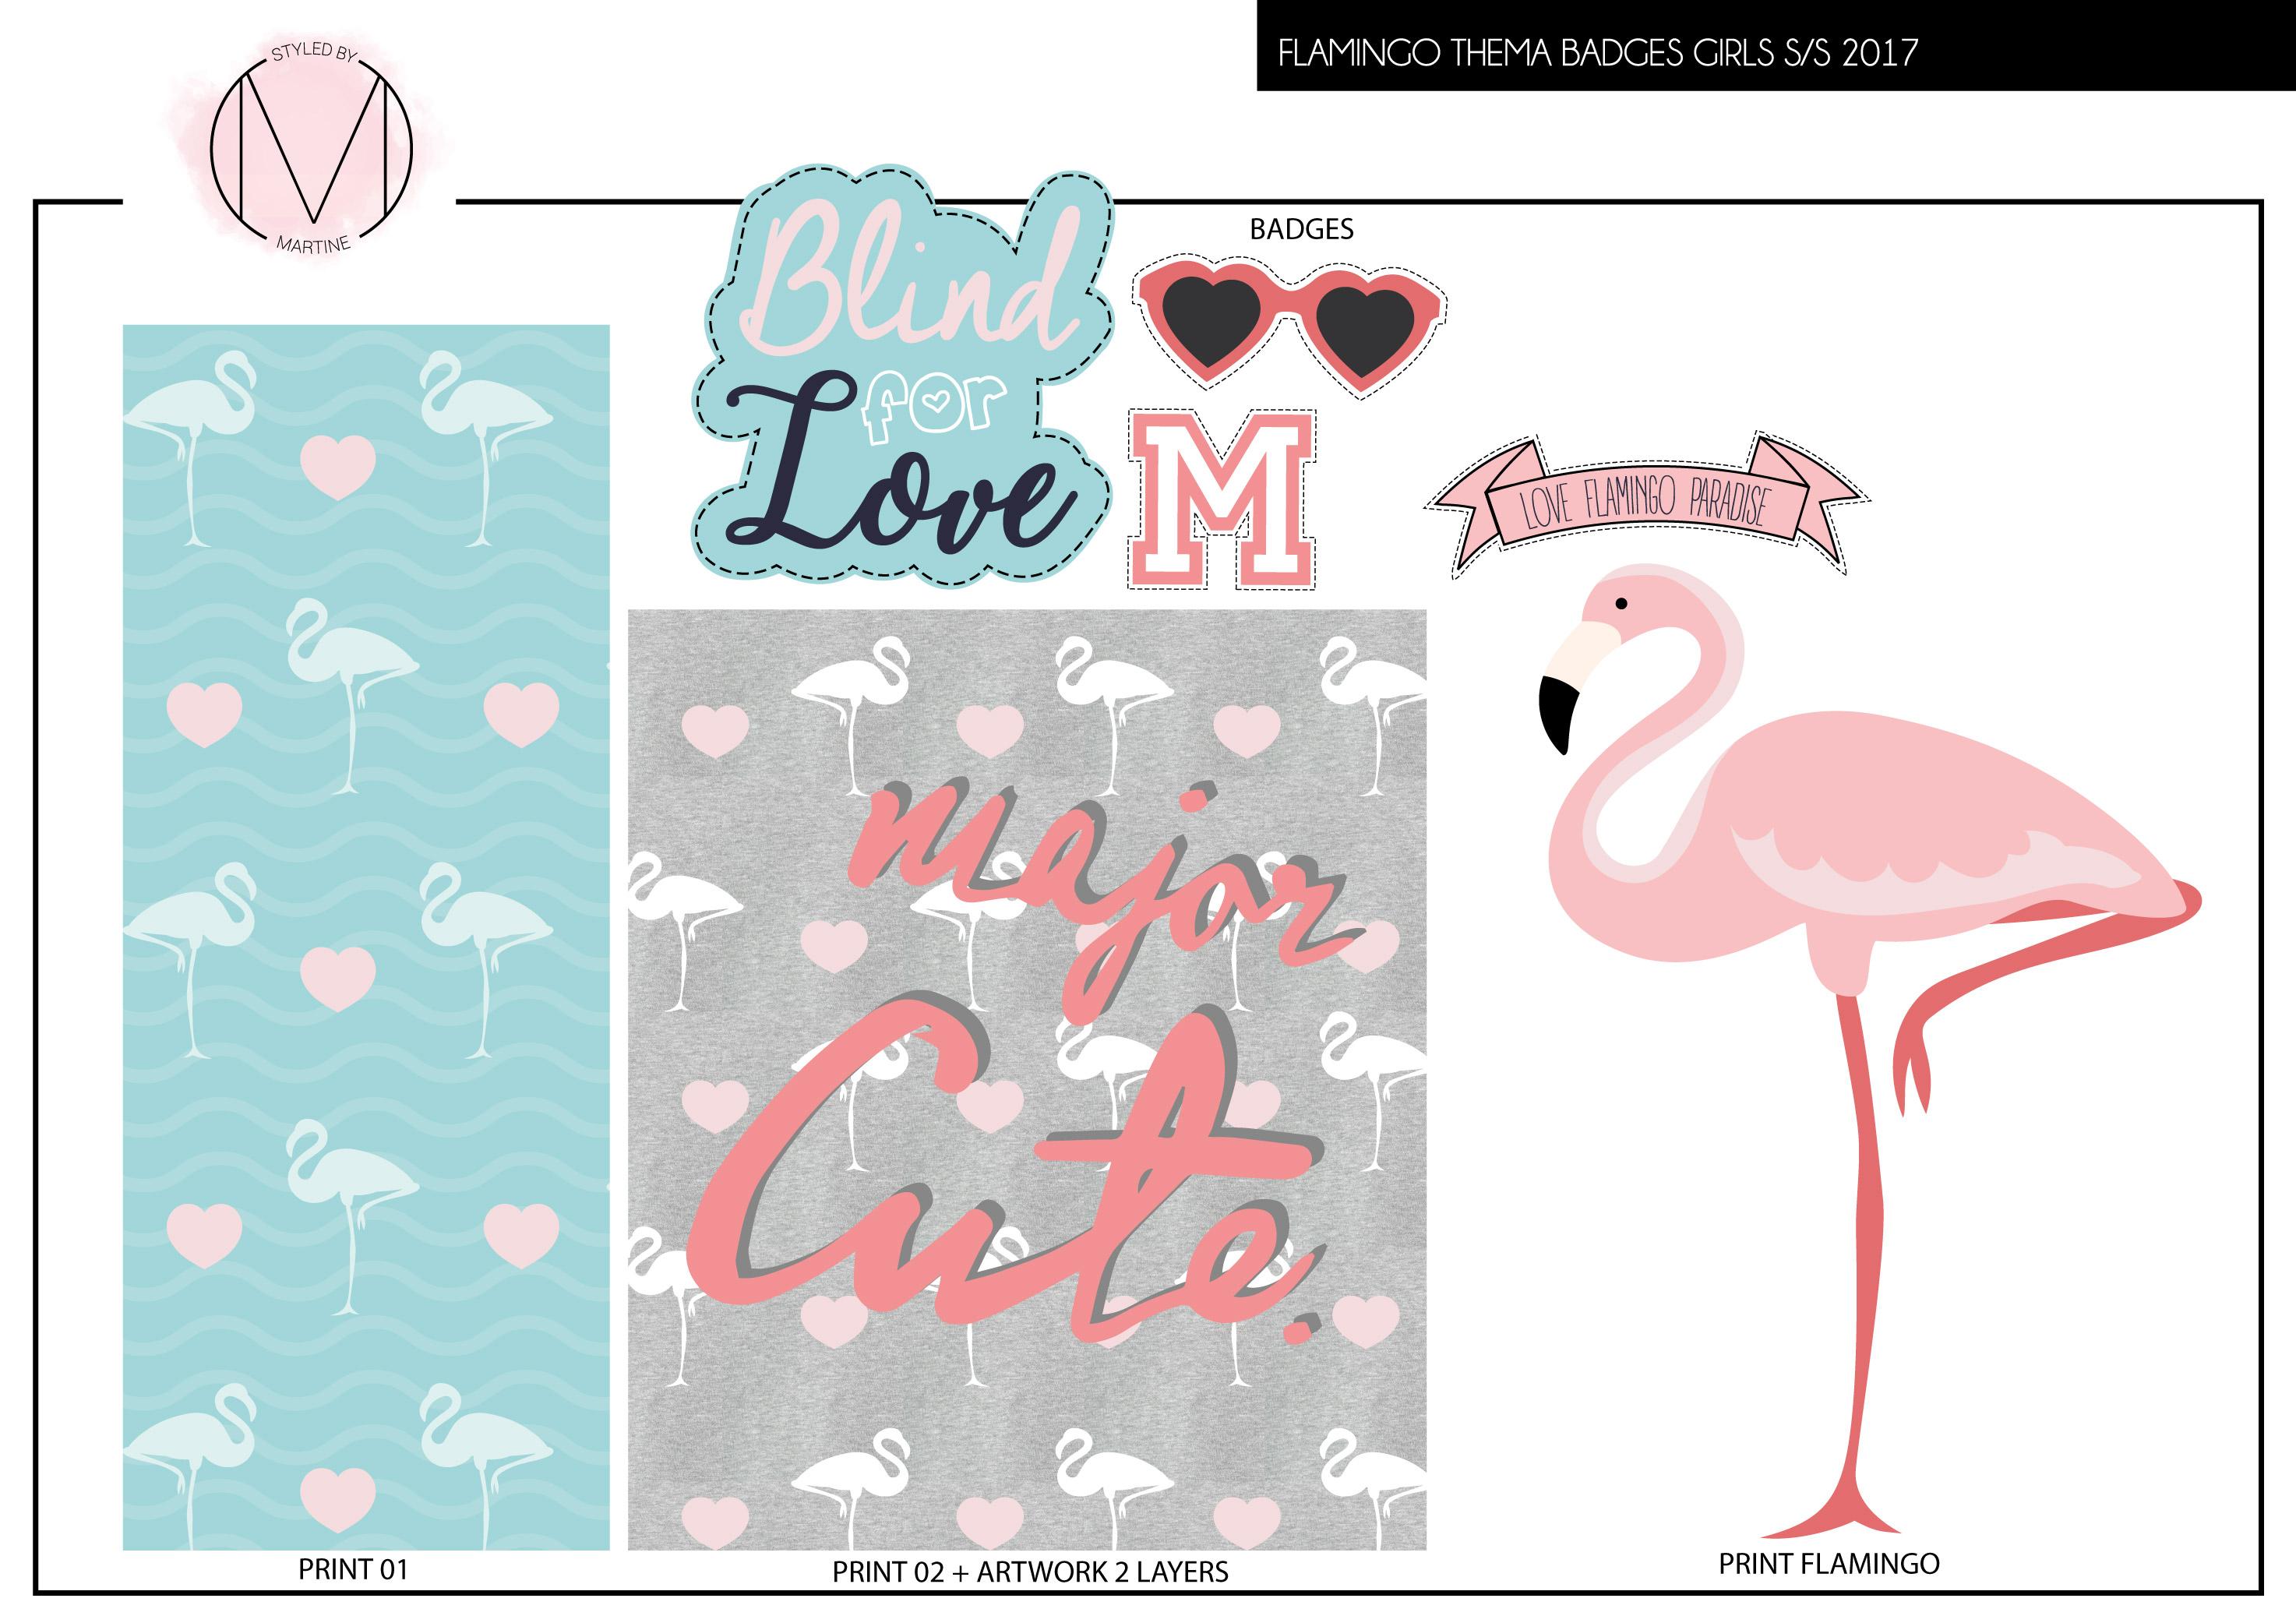 Flamingo-Thema-prints.jpg